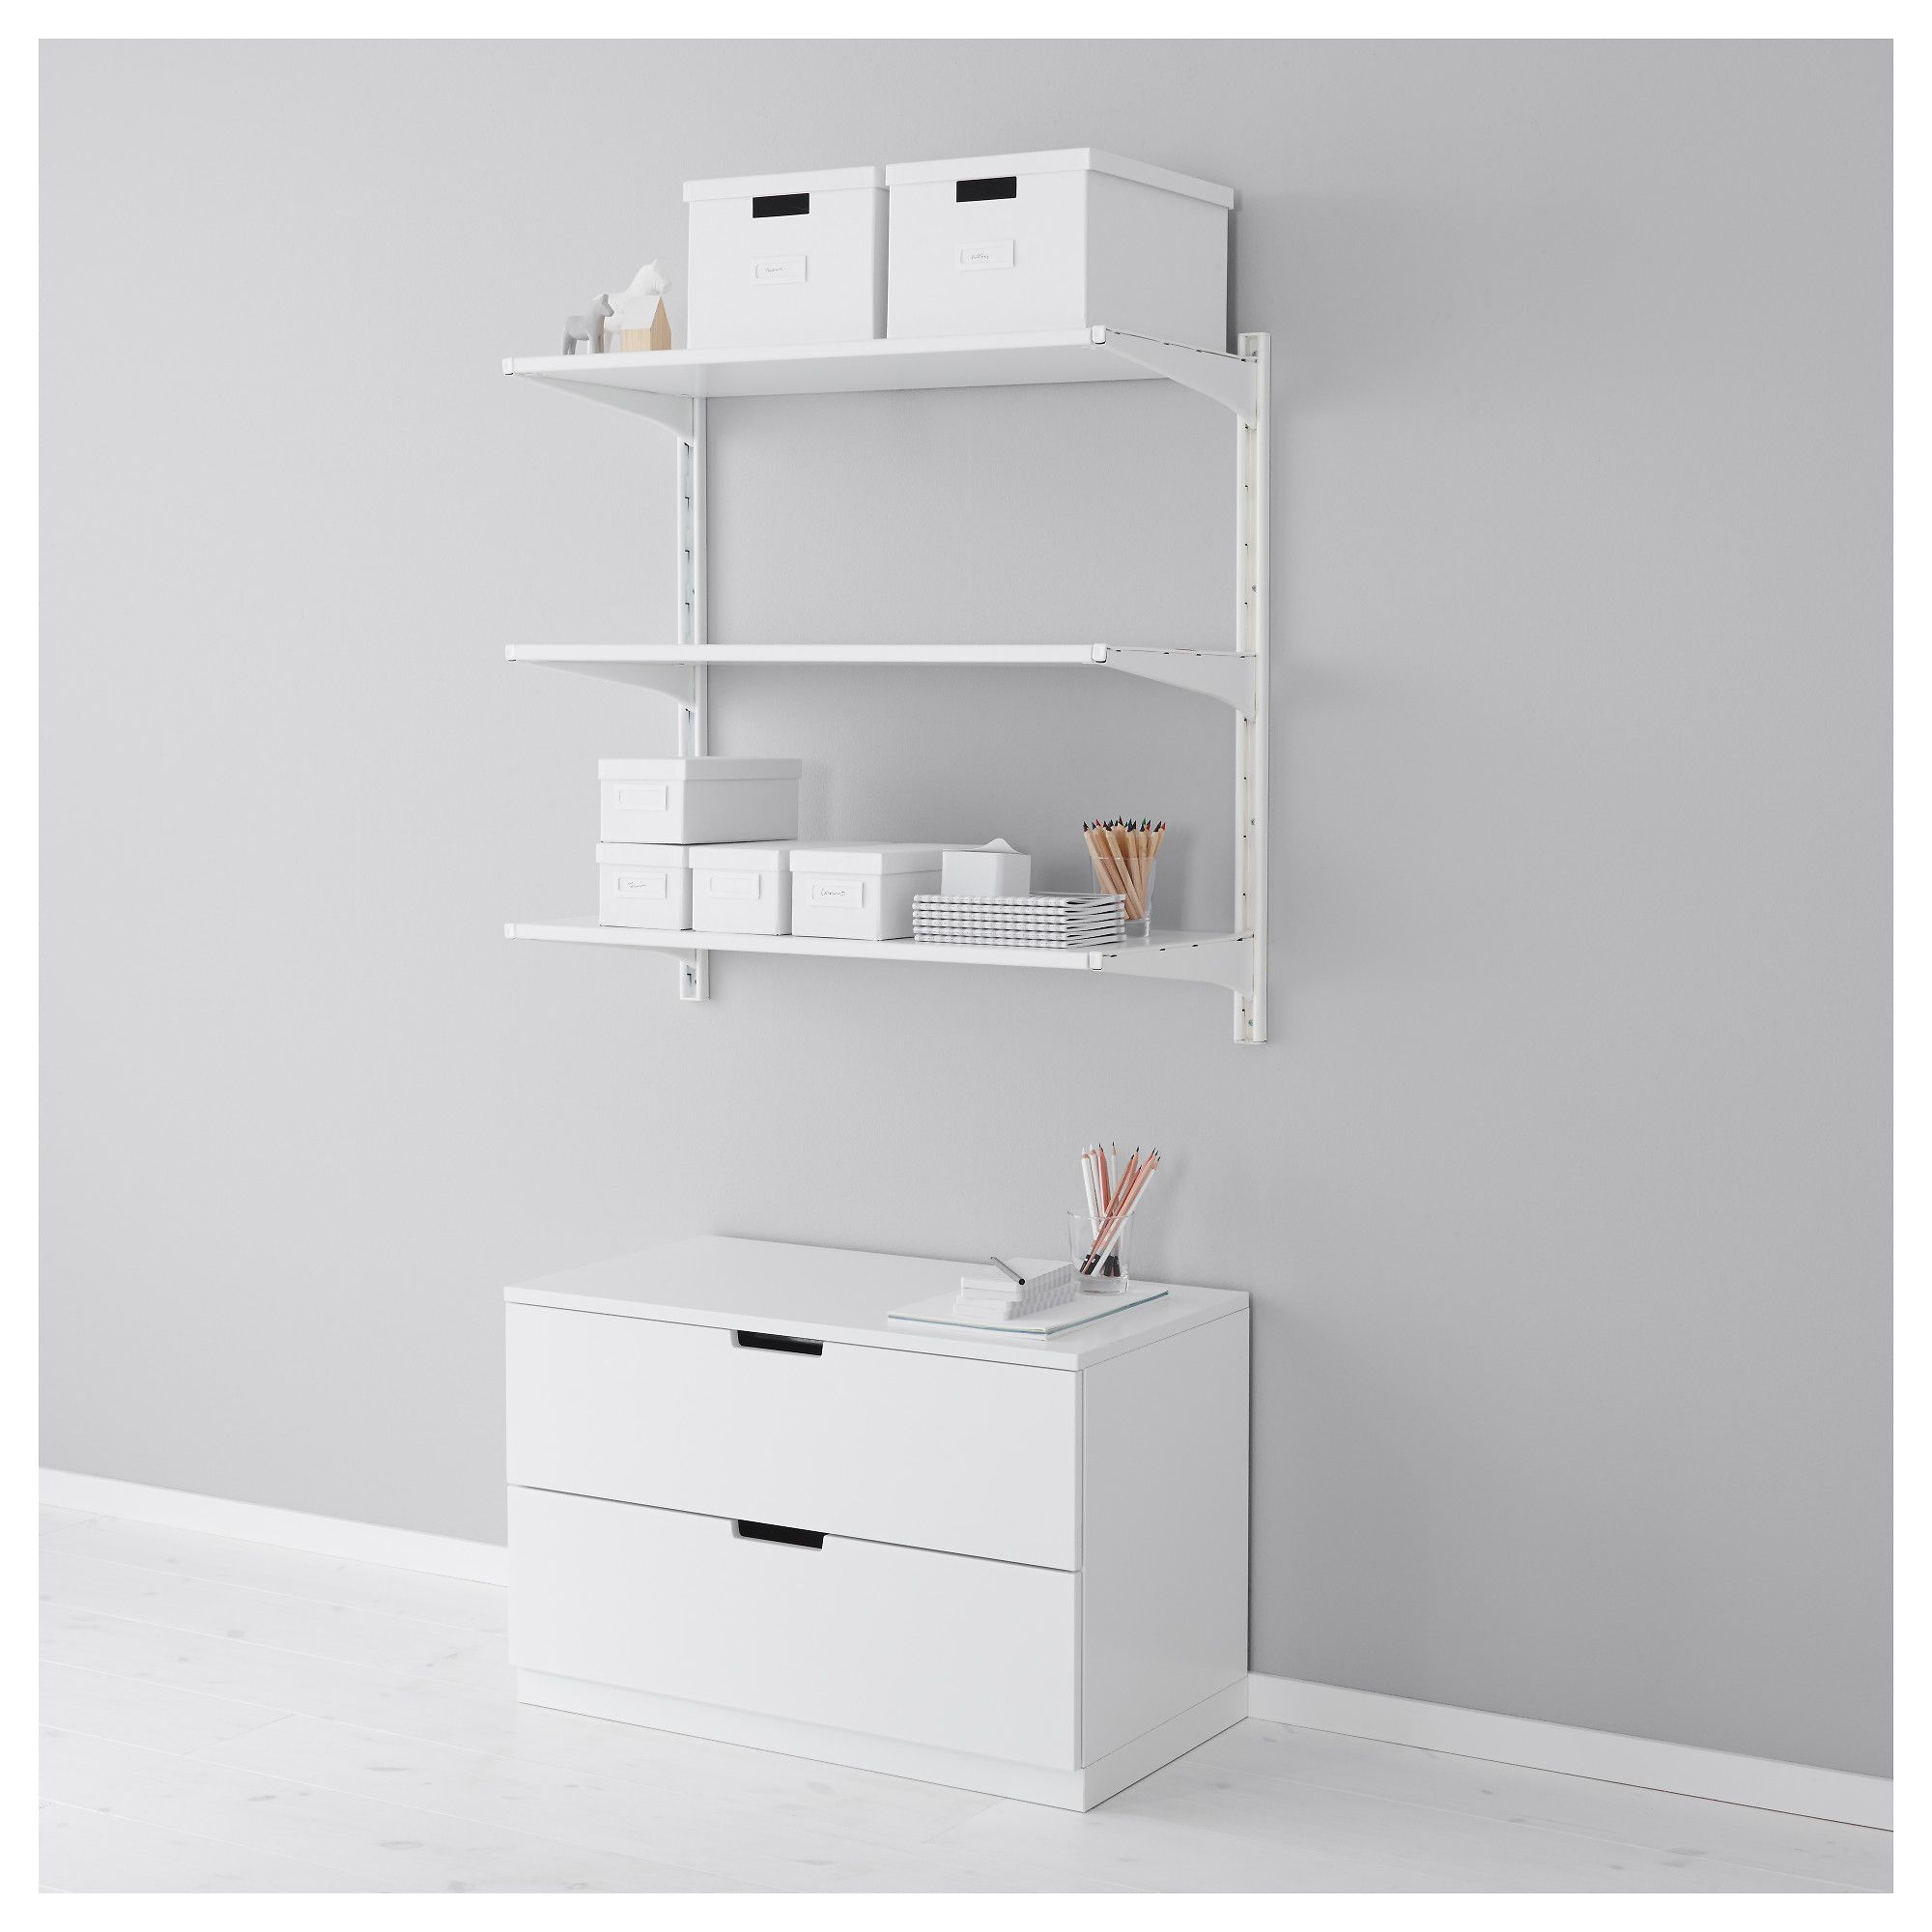 Algot Wall Upright Shelves White 33 7 8x16 1 8x33 1 2